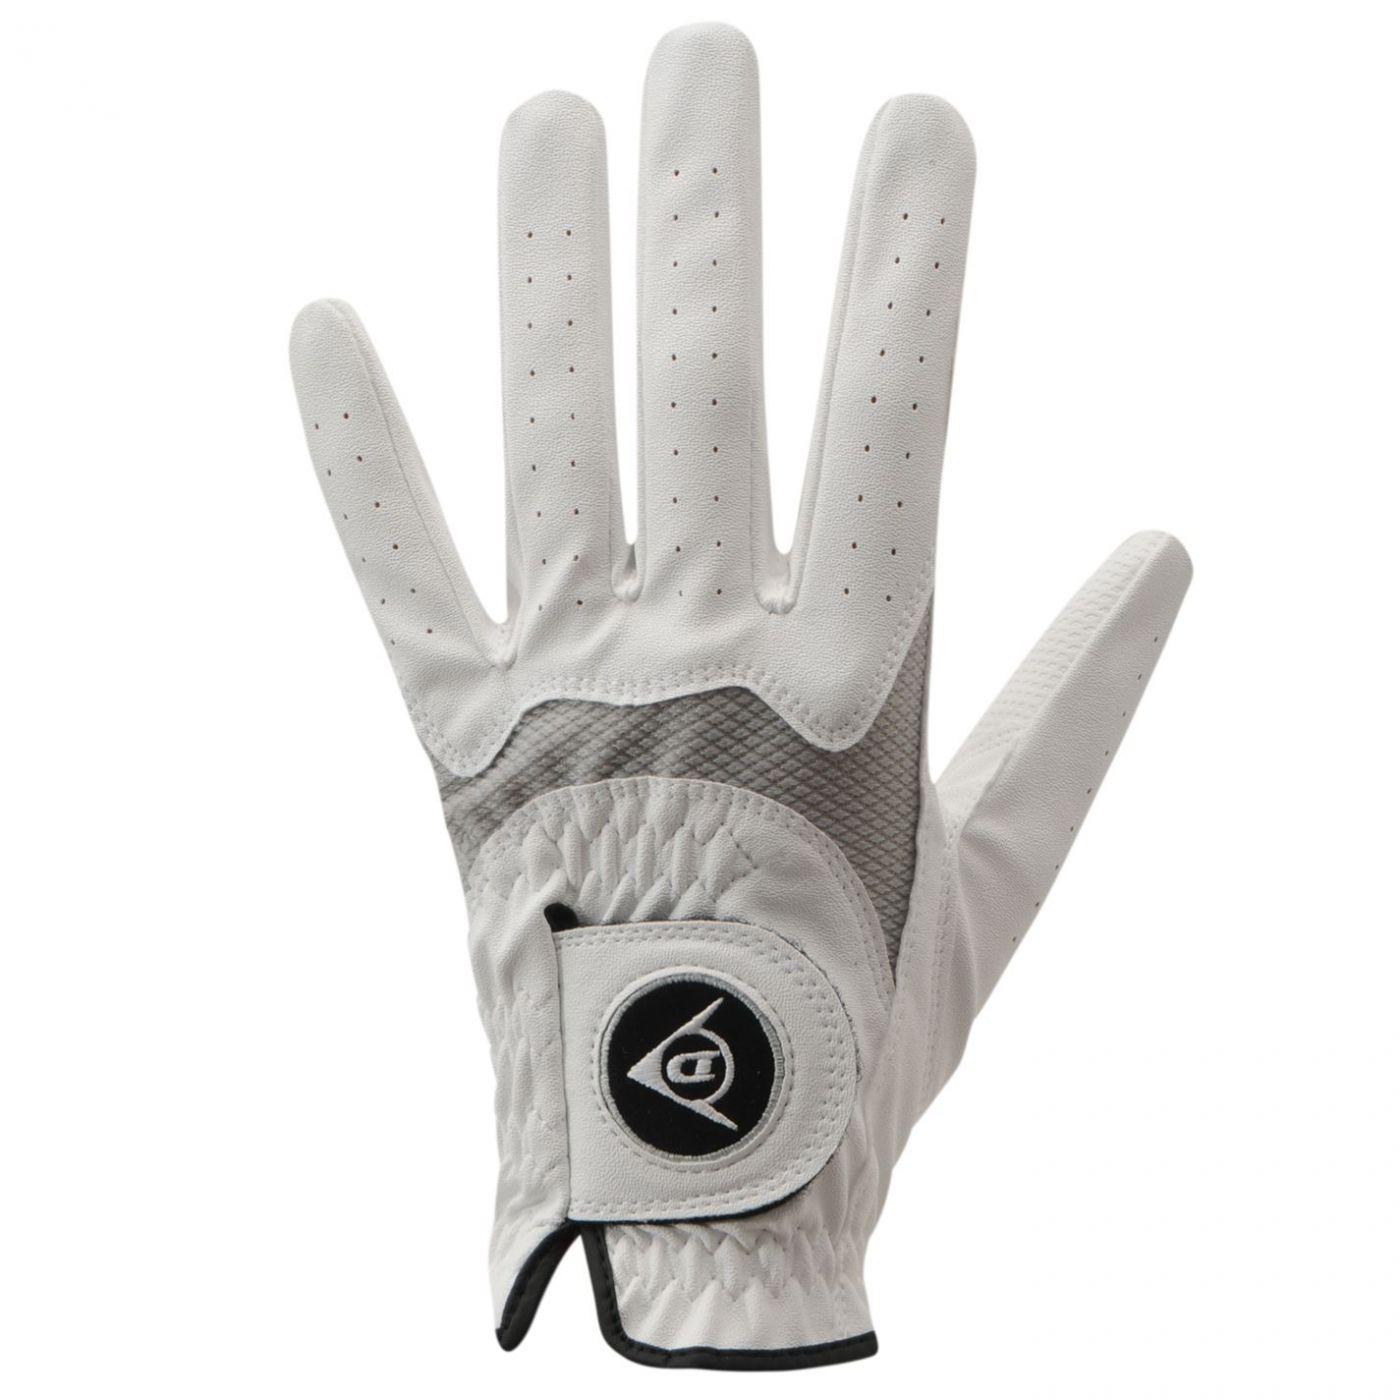 Dunlop Tour All Weather Golf Glove Ladies Left Hand